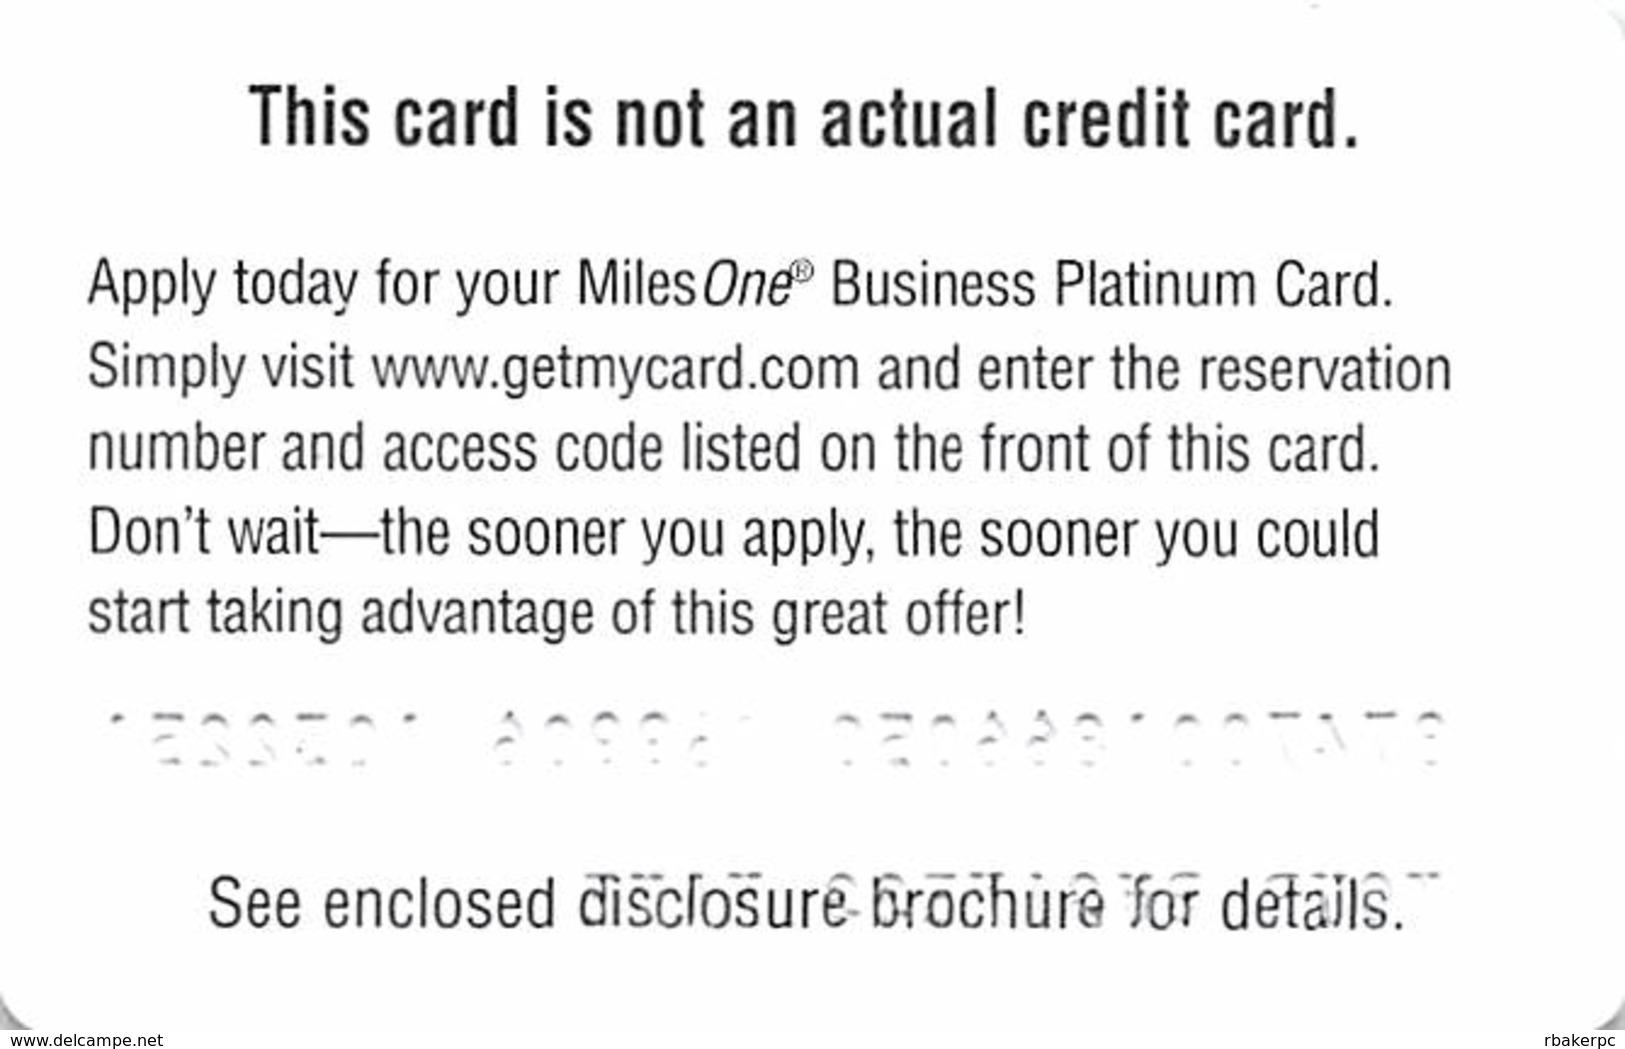 CapitalOne MilesOne Business Platinum Sample Card (blank Reverse) With 04PL001373 - Cartes De Crédit (expiration Min. 10 Ans)